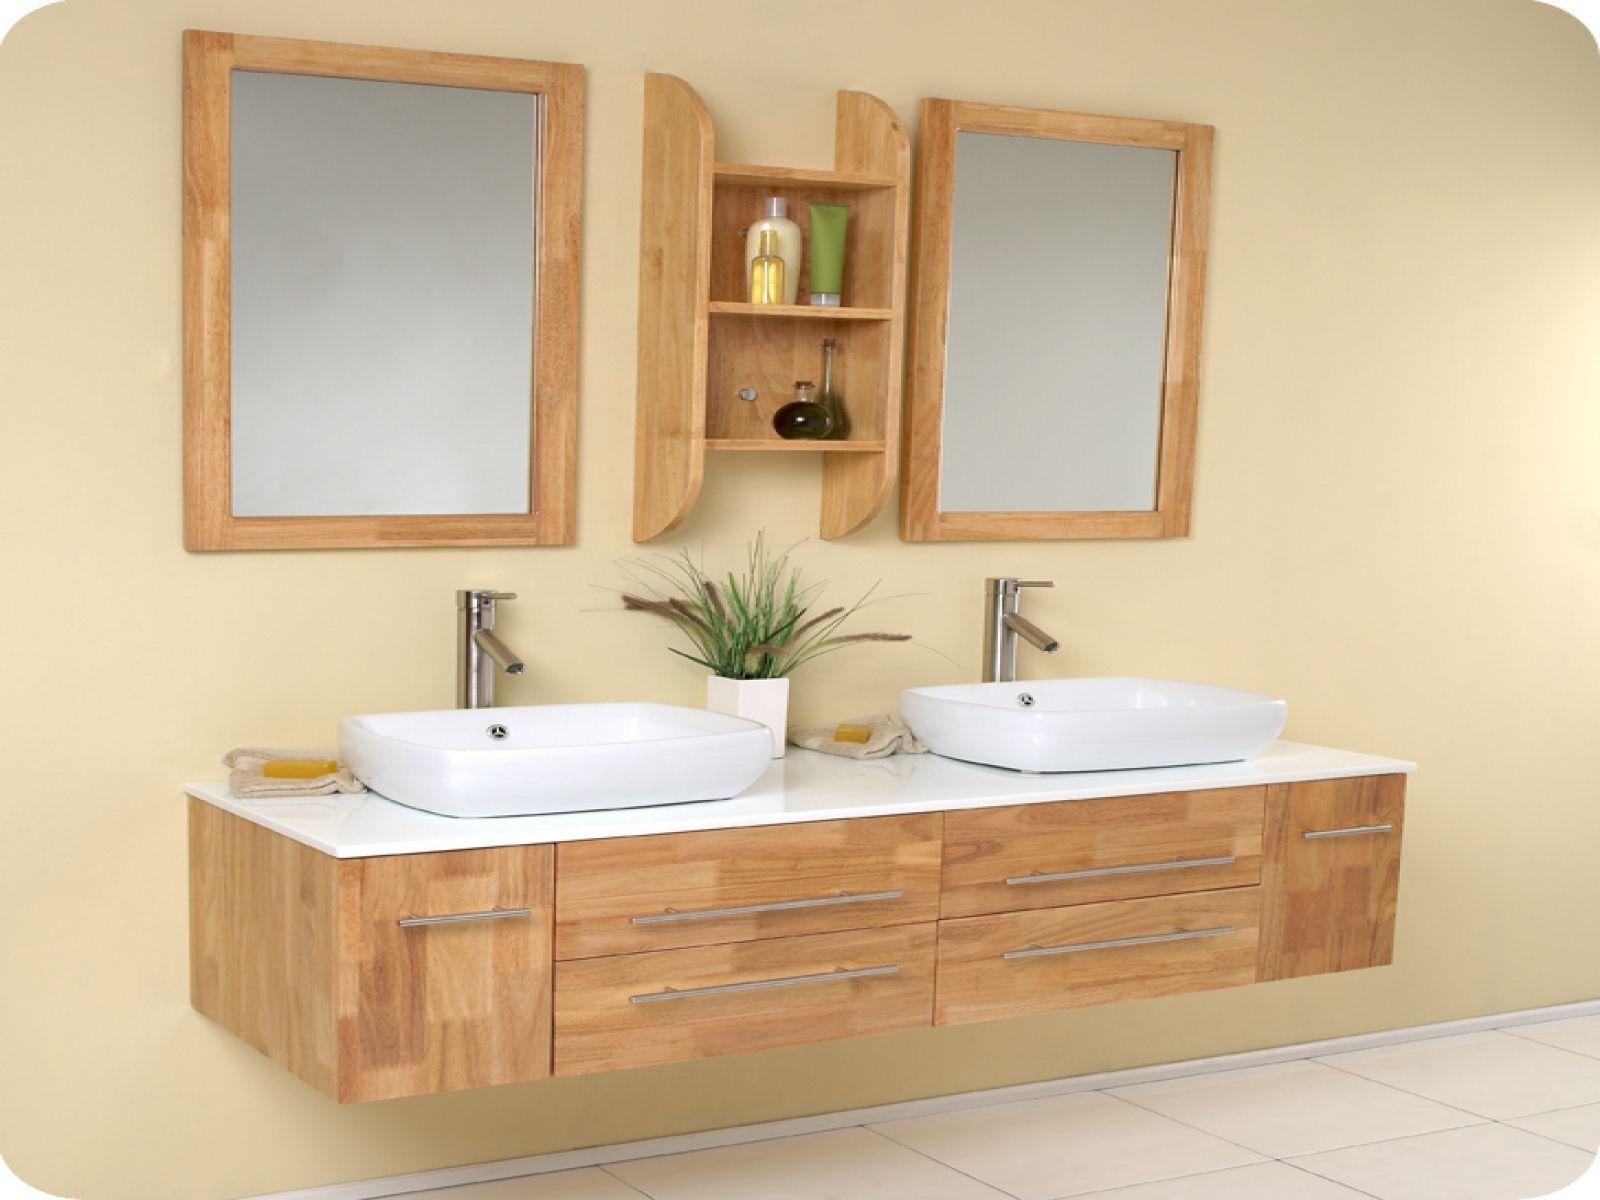 Classic Retro Fresca Vanity With Double Sink And Bathroom Mirror Plus Floating Shelves Bes Small Bathroom Vanities Contemporary Bathroom Vanity Bathroom Vanity